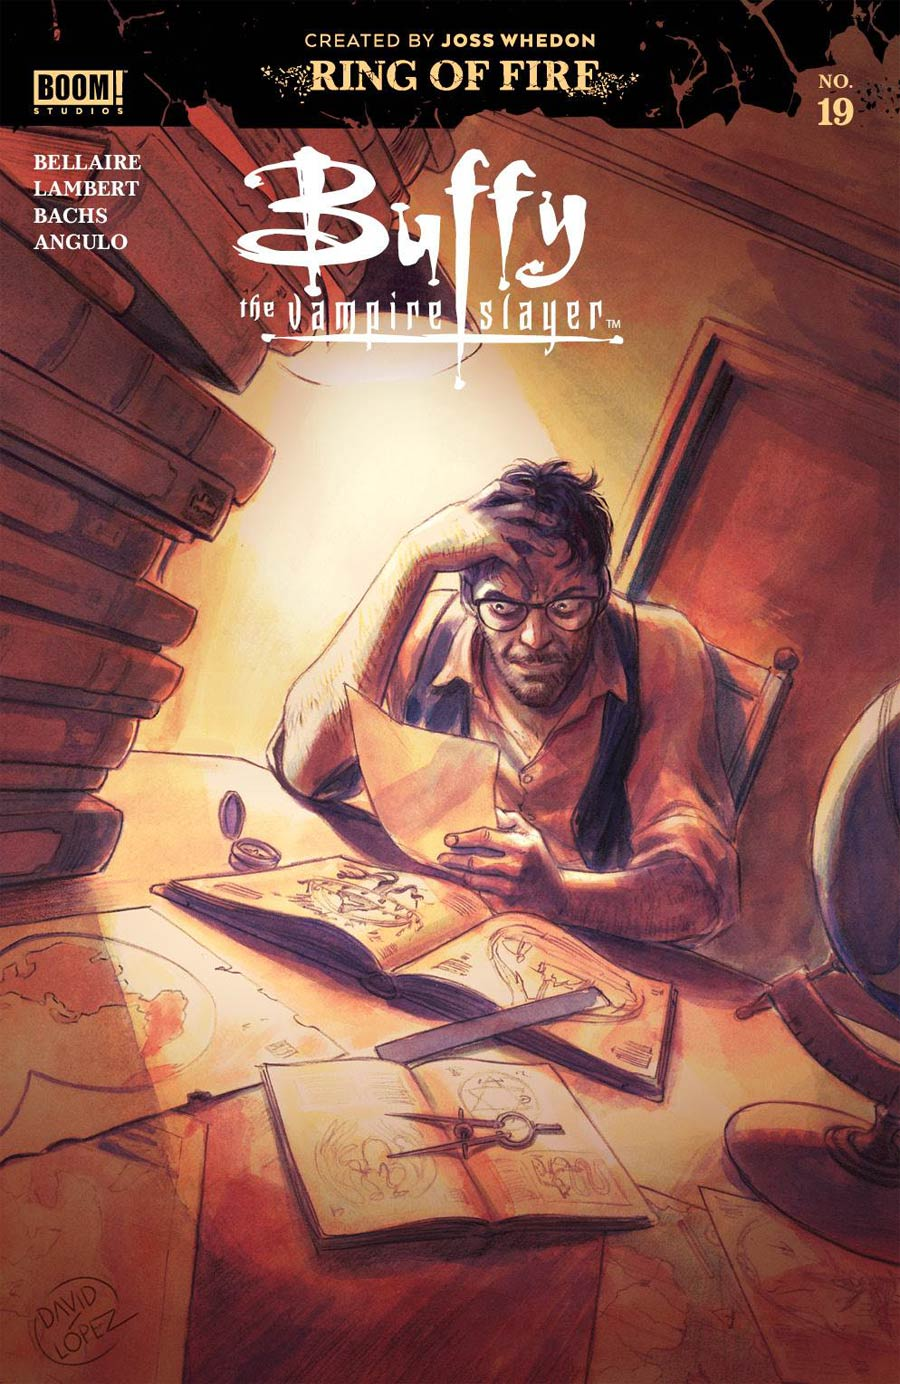 Buffy The Vampire Slayer Vol 2 #19 Cover A Regular David Lopez Cover